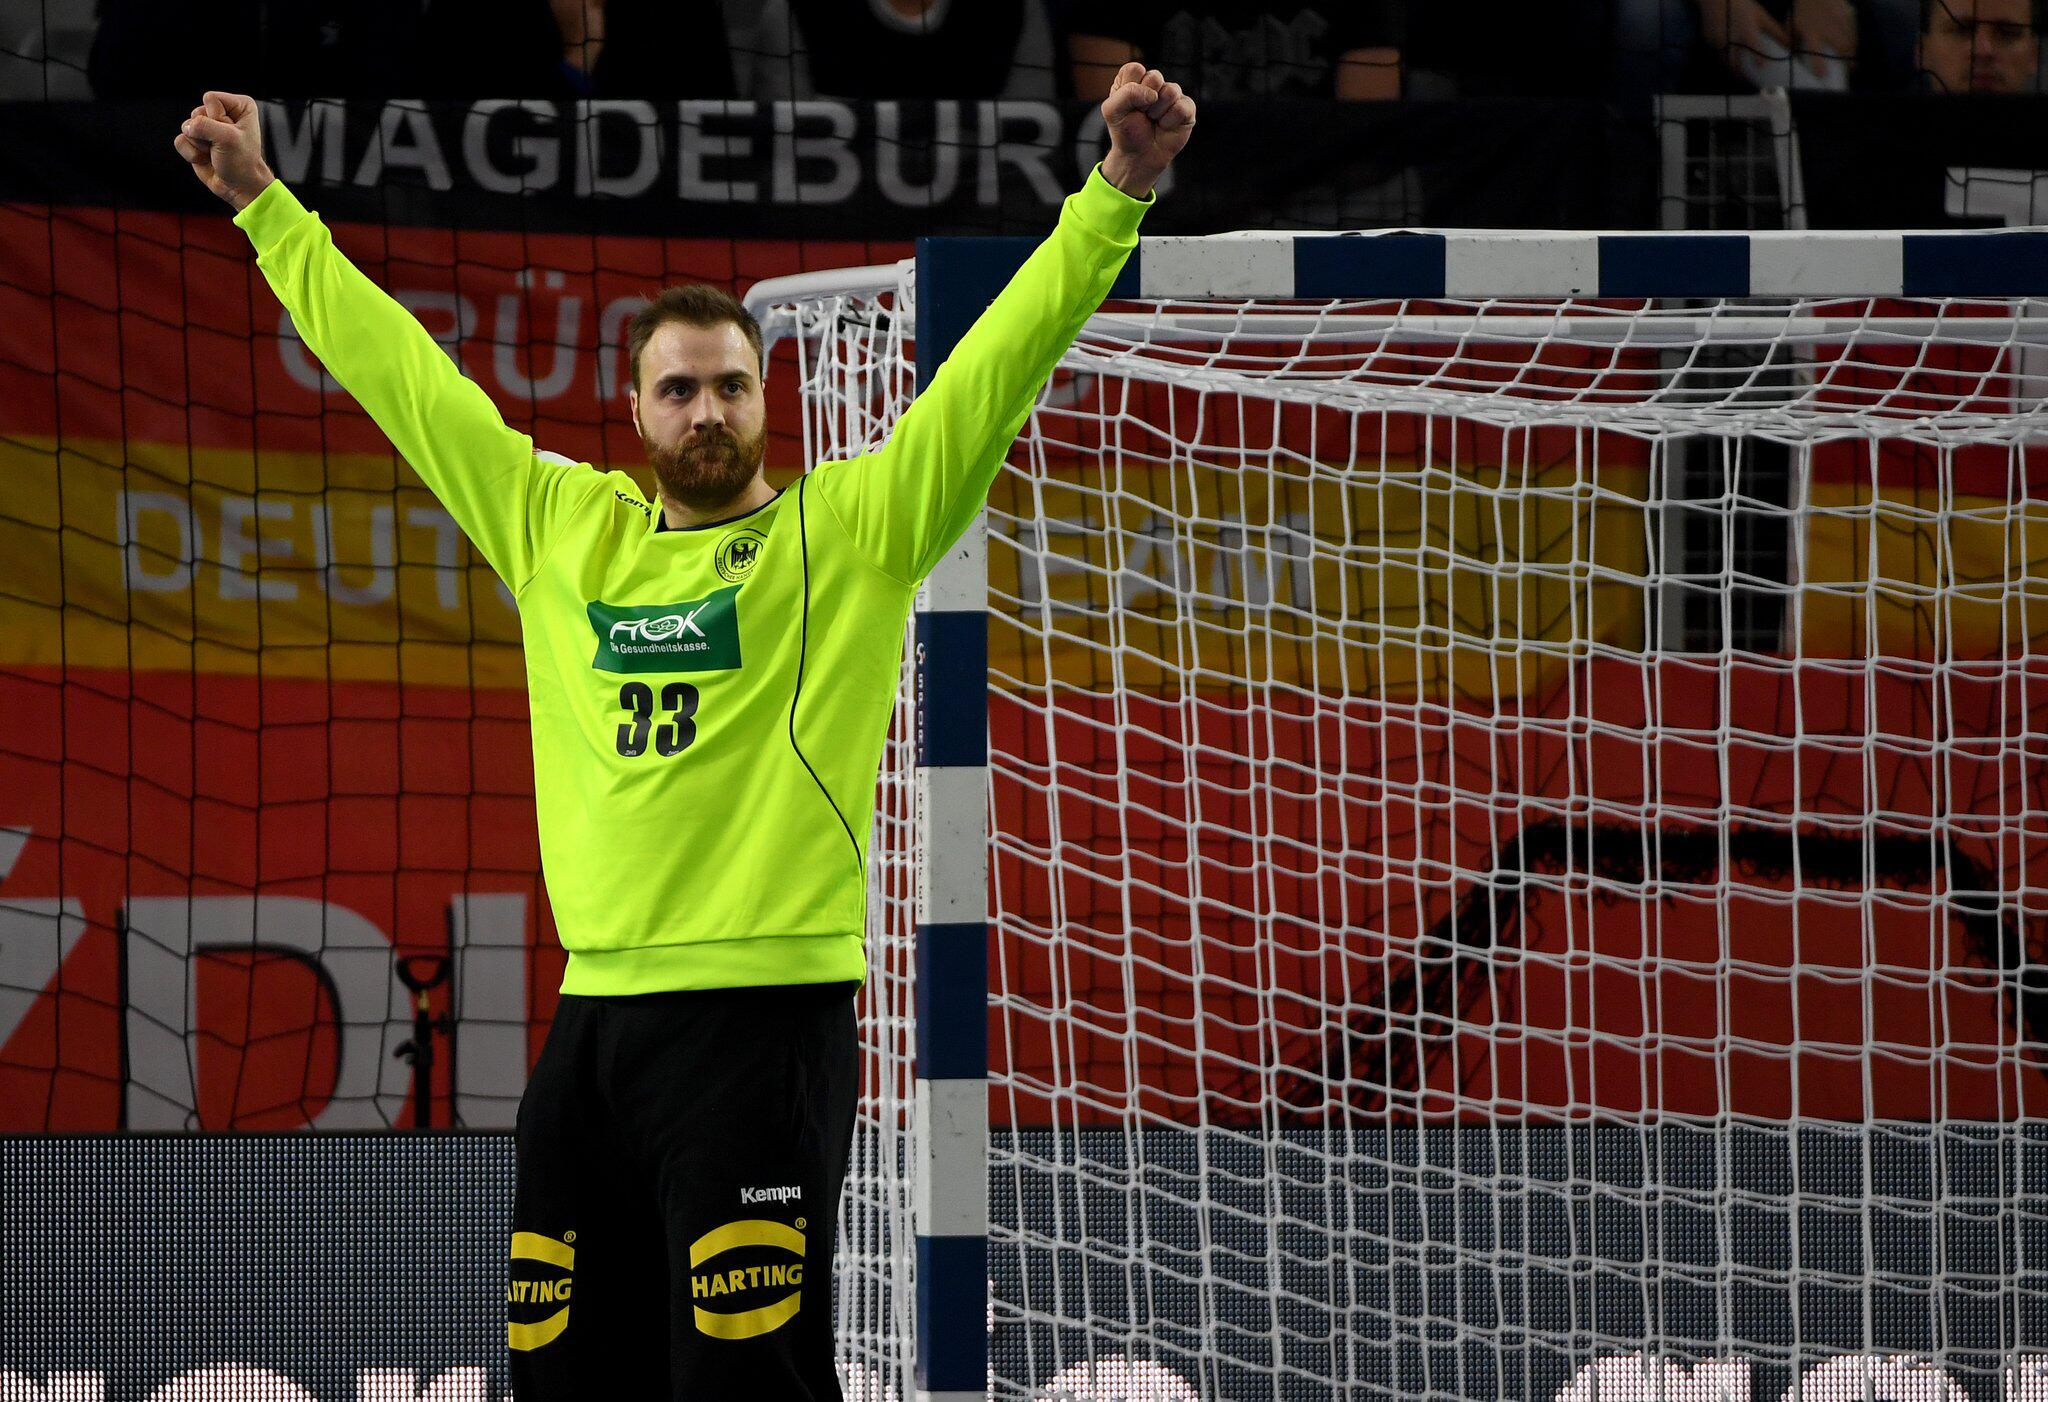 handball em ergebnisse hauptrunde